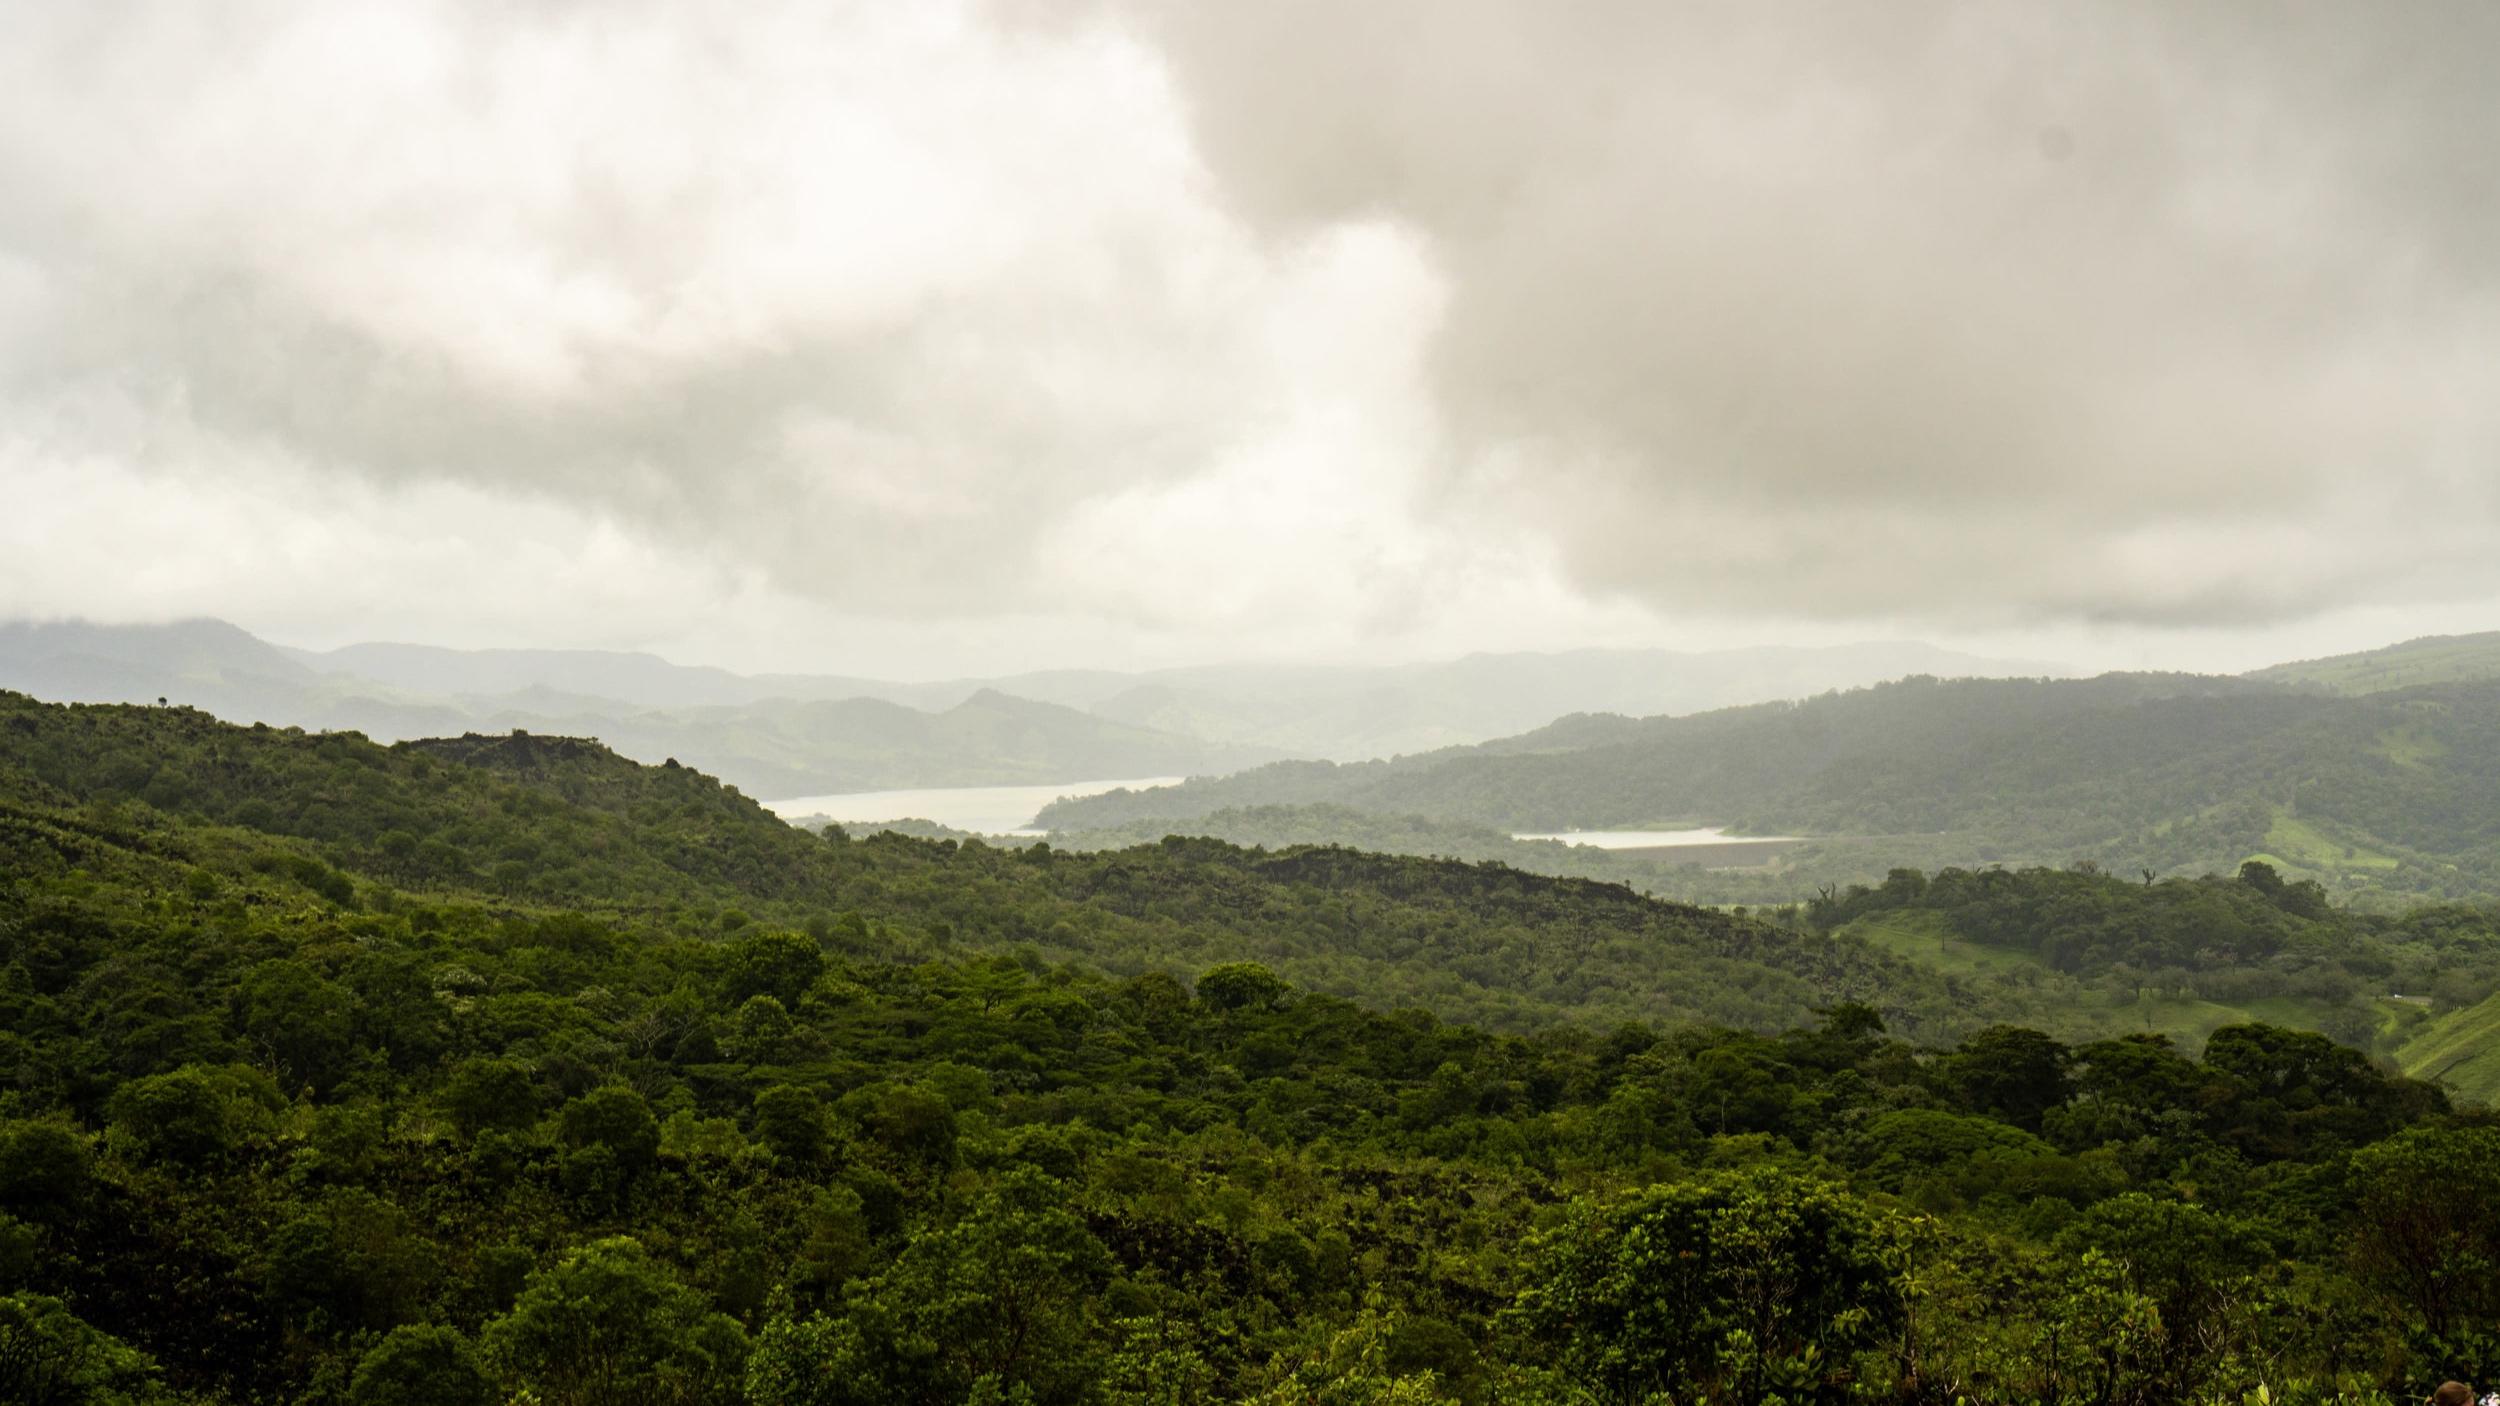 Costa_Rica_view_Travel_Photos_Rebecca_Blue_Media